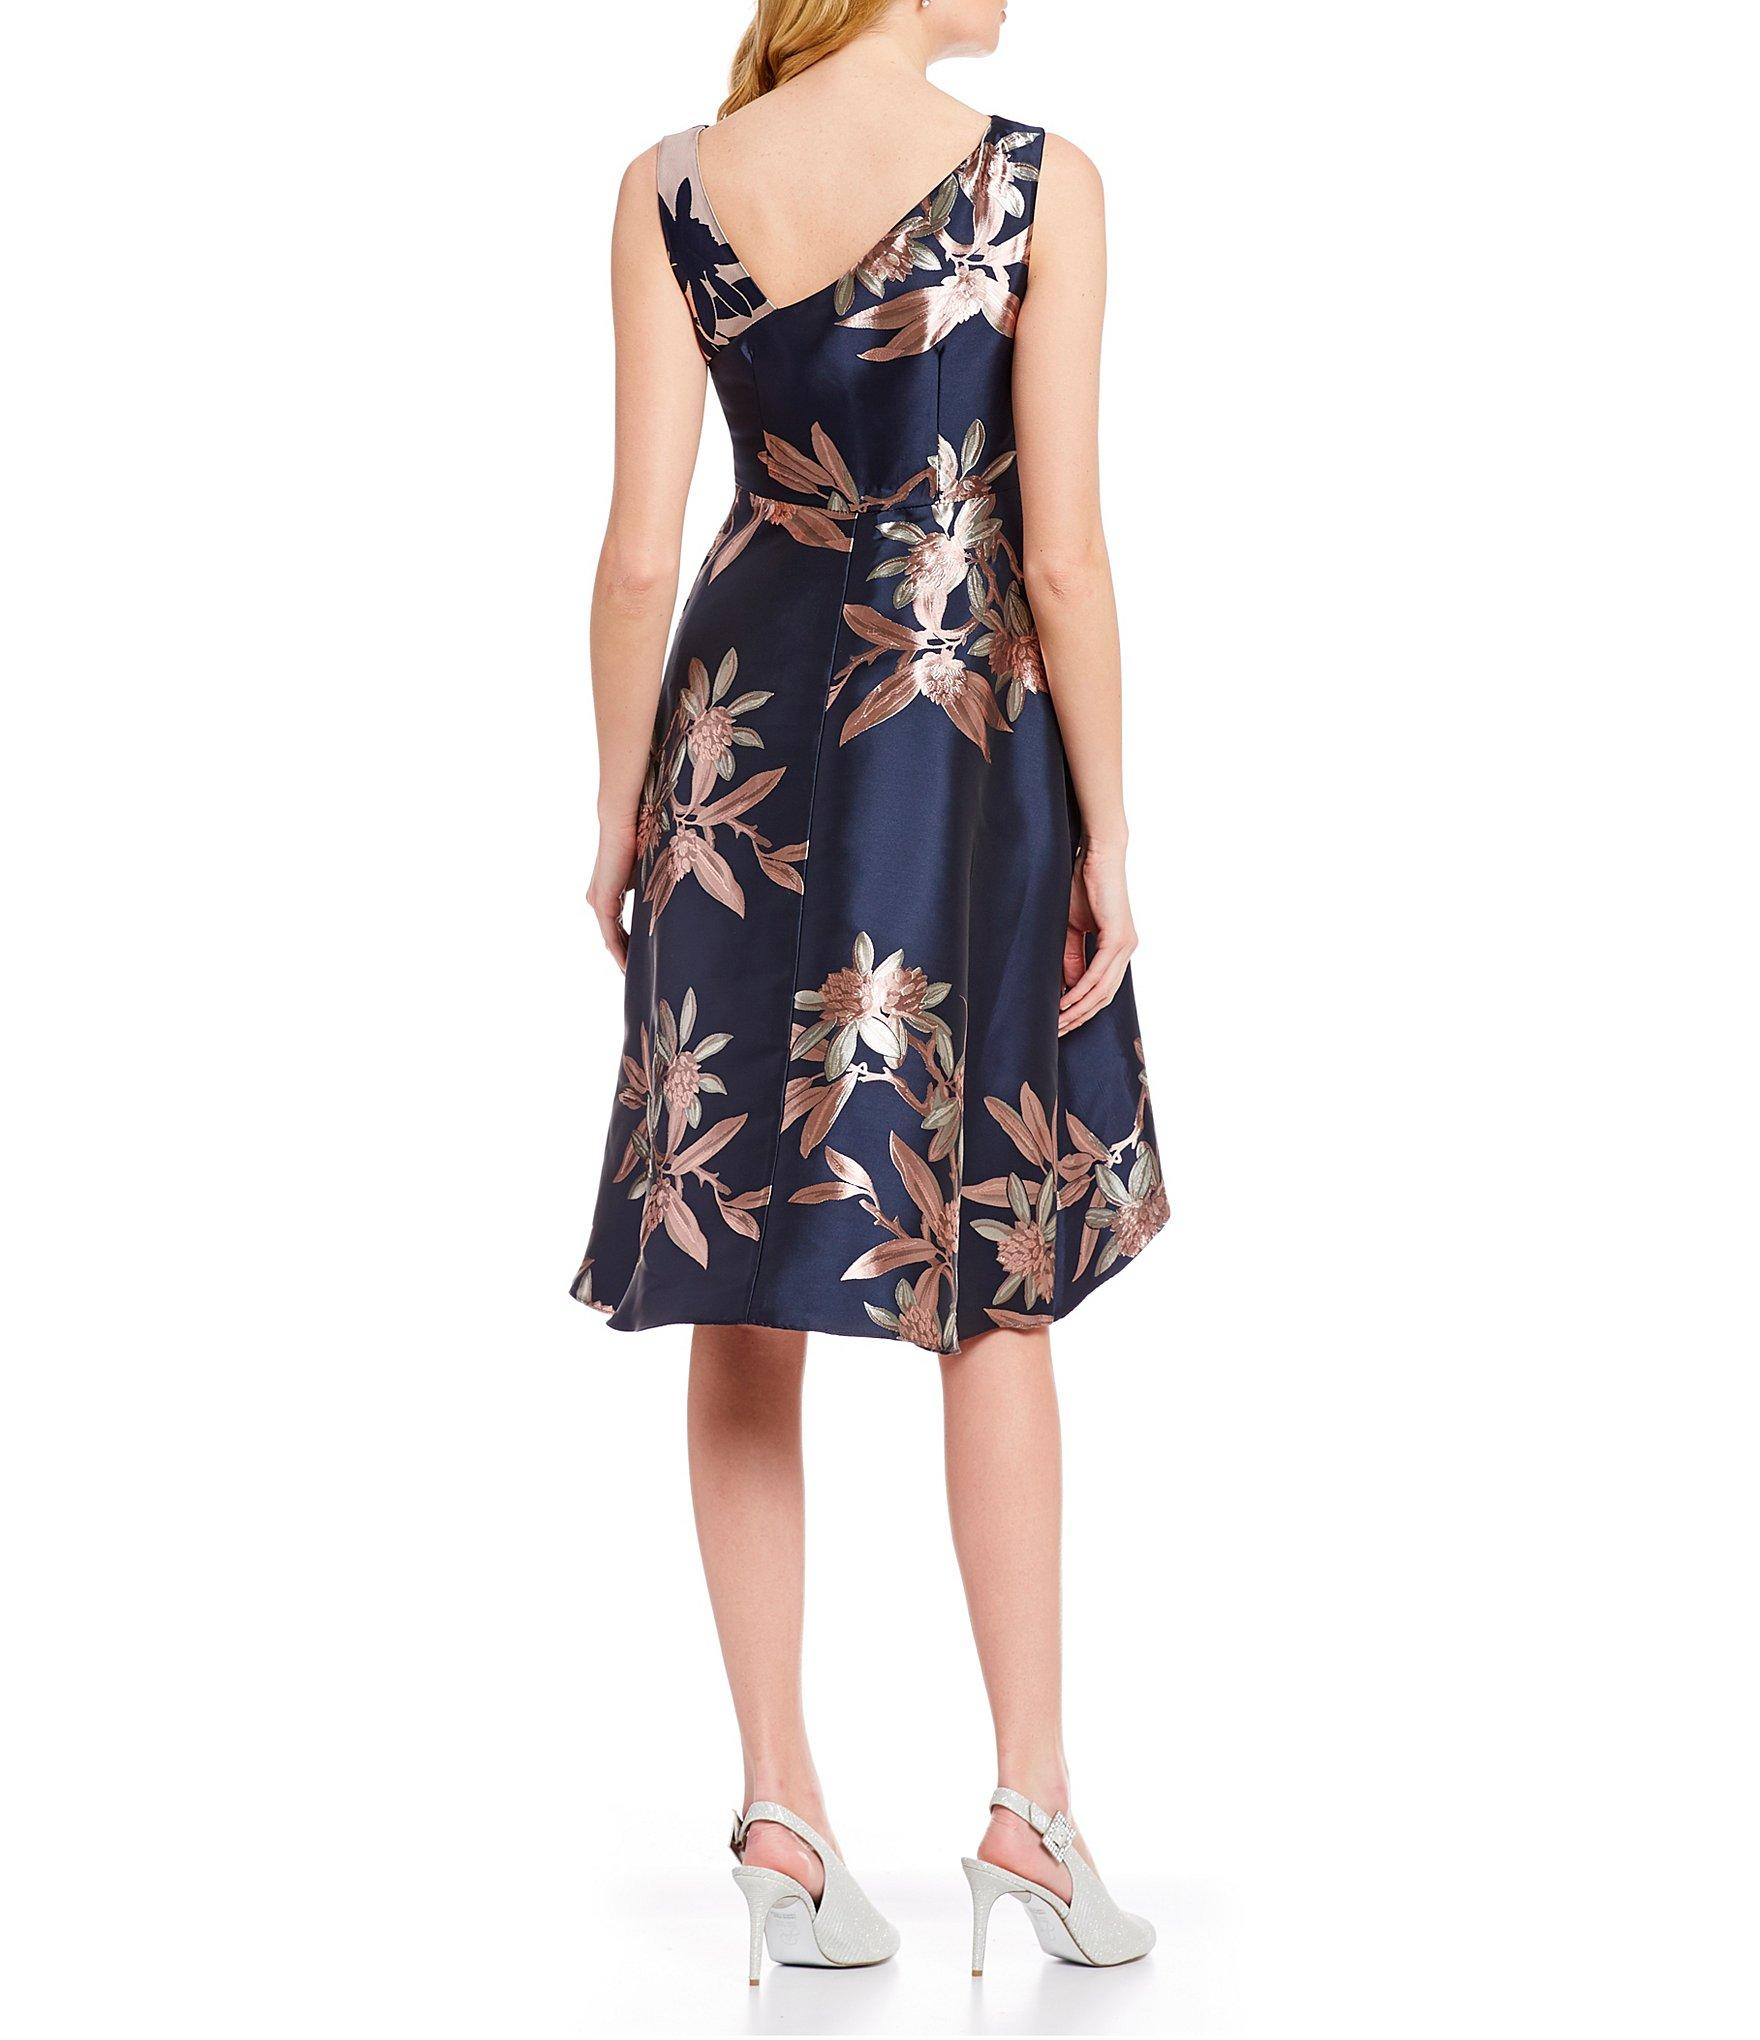 07aaf6e5017f3 Adrianna Papell - Blue Petite Size Floral Print Jacquard Sleeveless Cascade  Hi-low Dress -. View fullscreen